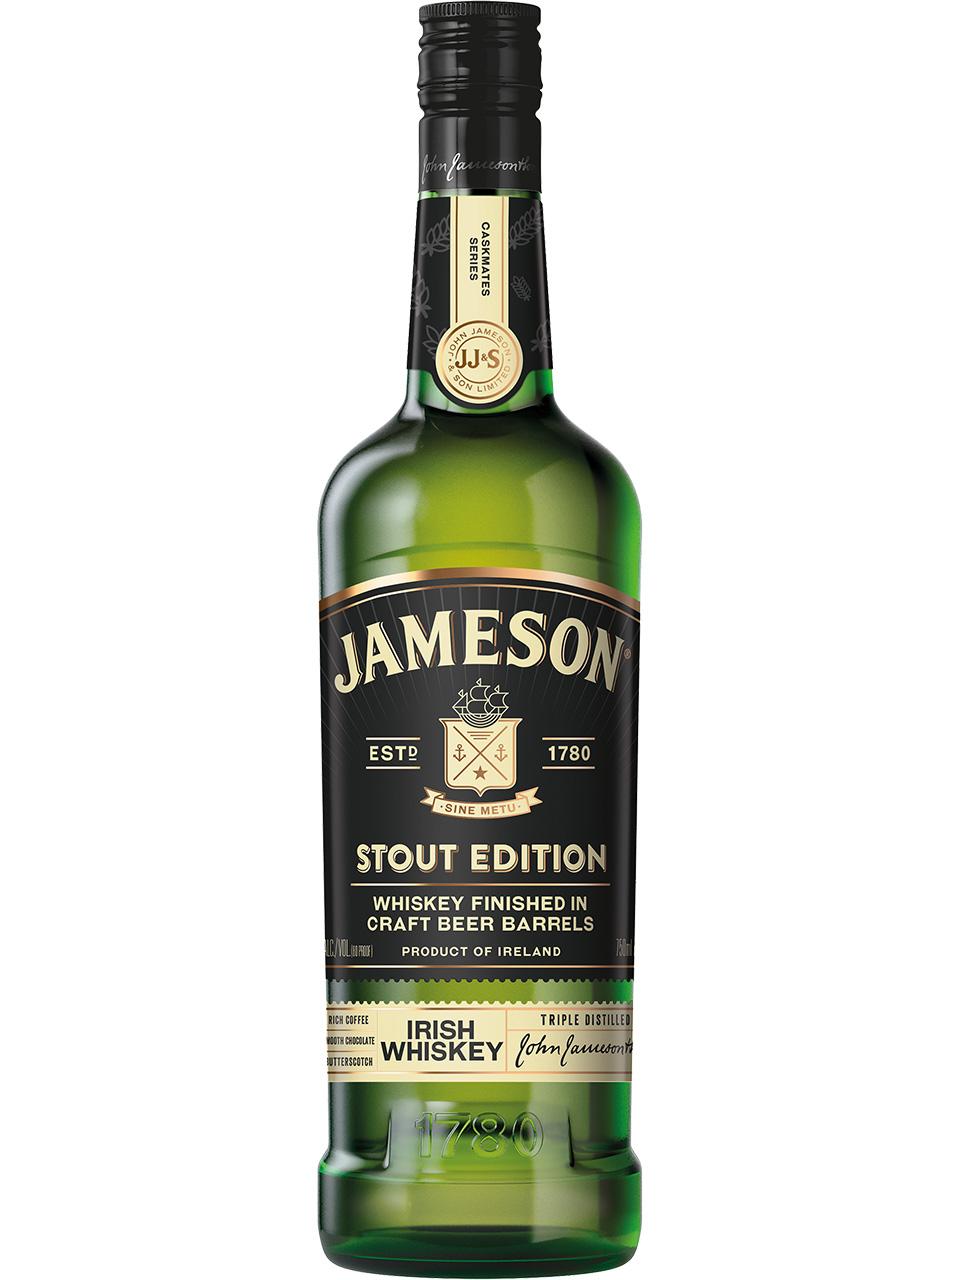 Jameson Stout Edition Irish Whiskey